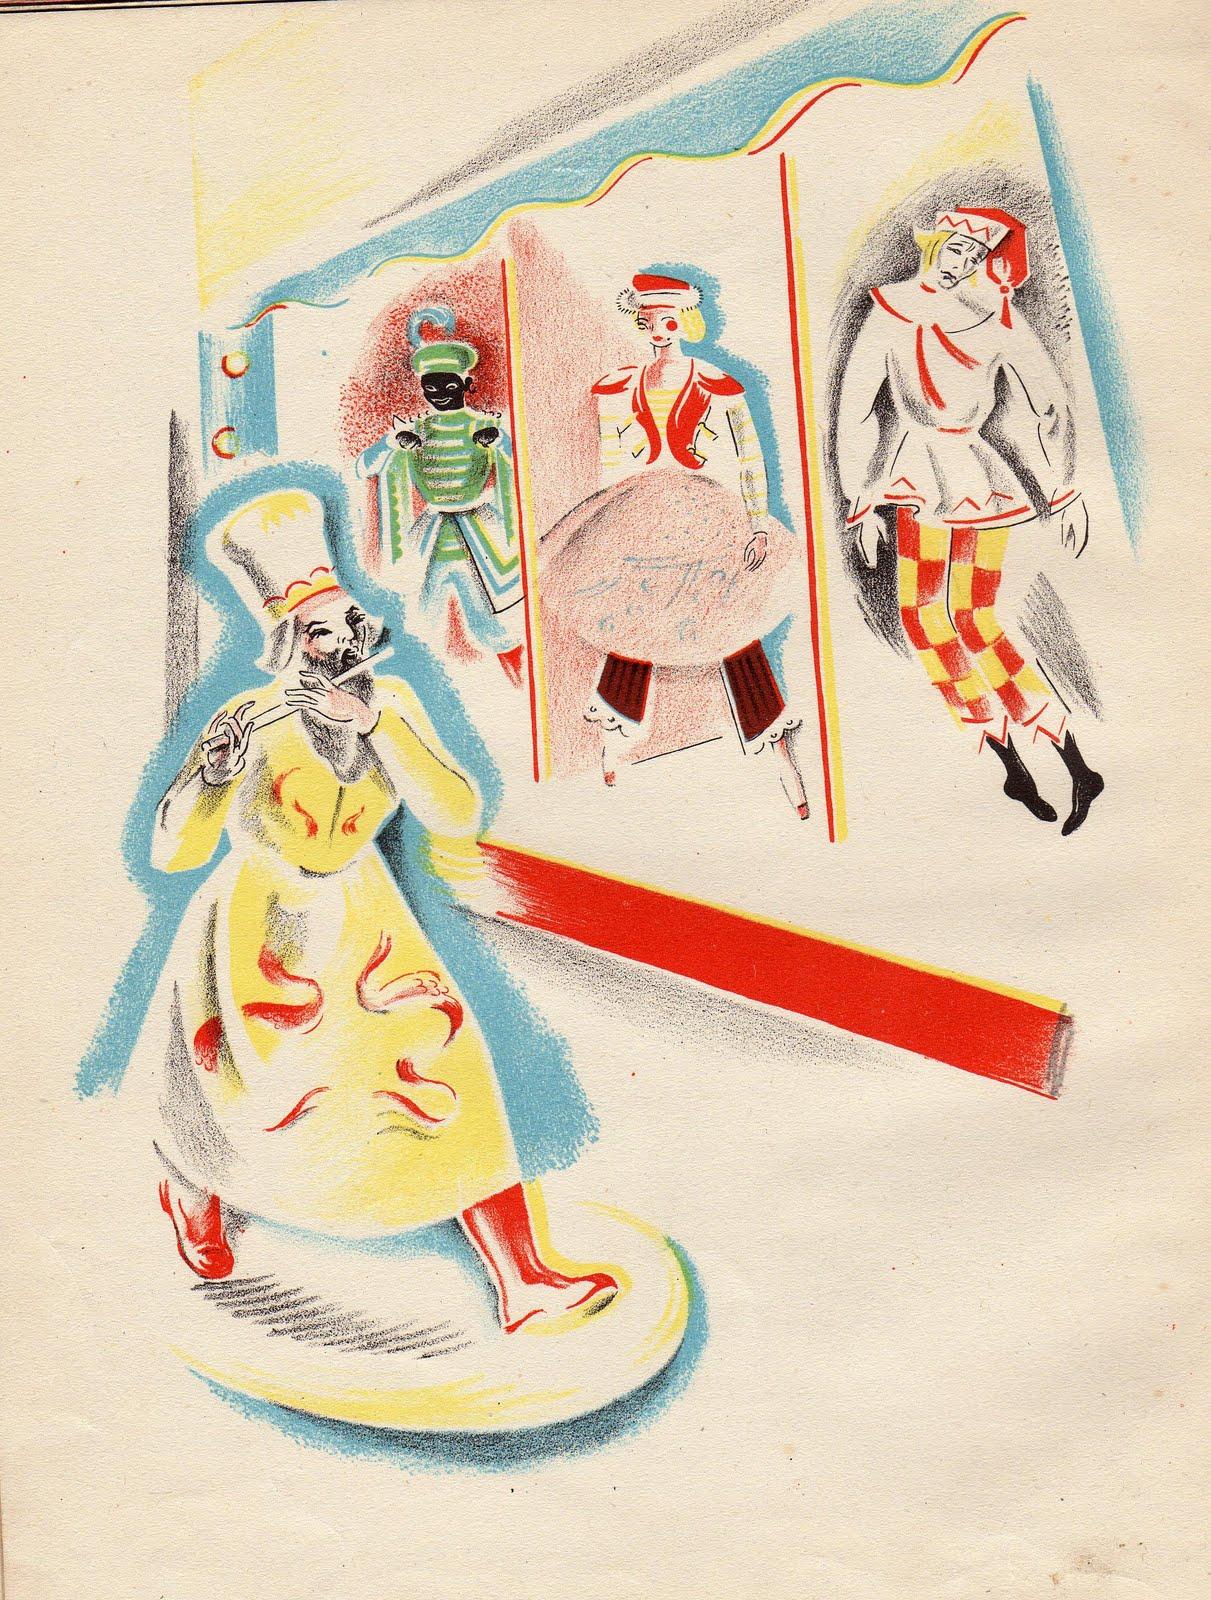 The Russian folk puppet Petrushka